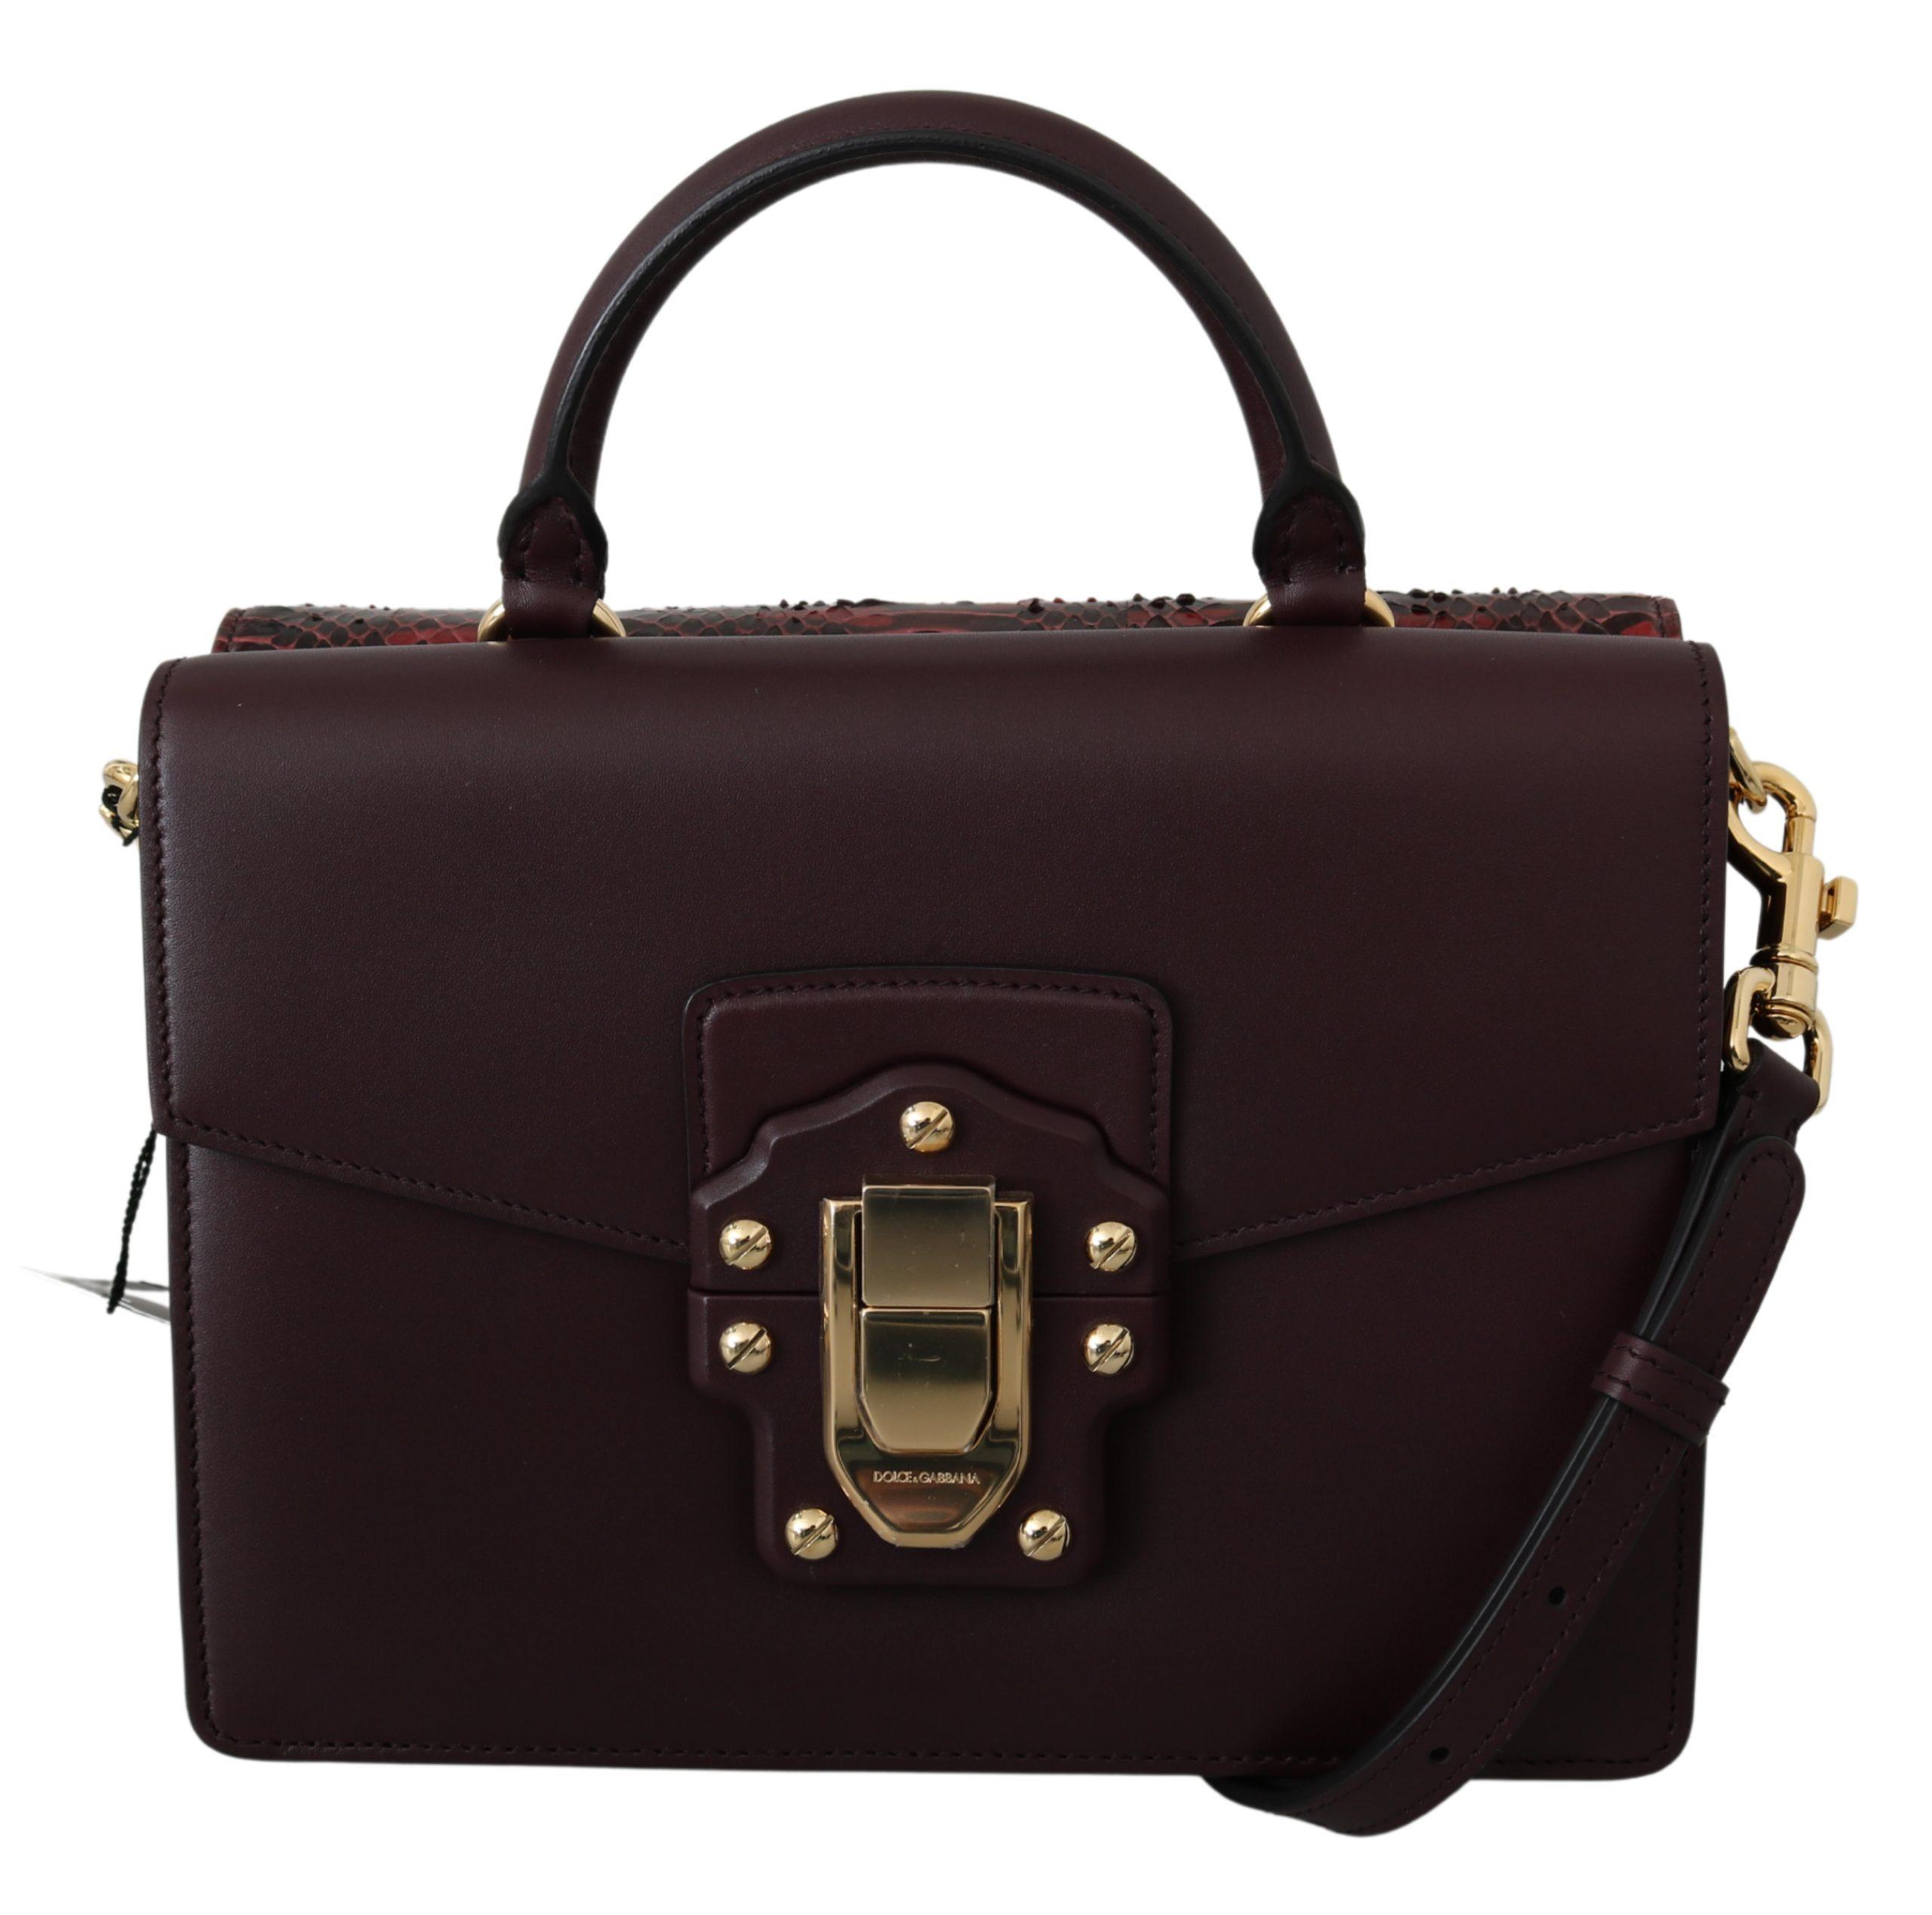 Dolce & Gabbana Women's Snakeskin Leather Shoulder Bag Black VAS9595